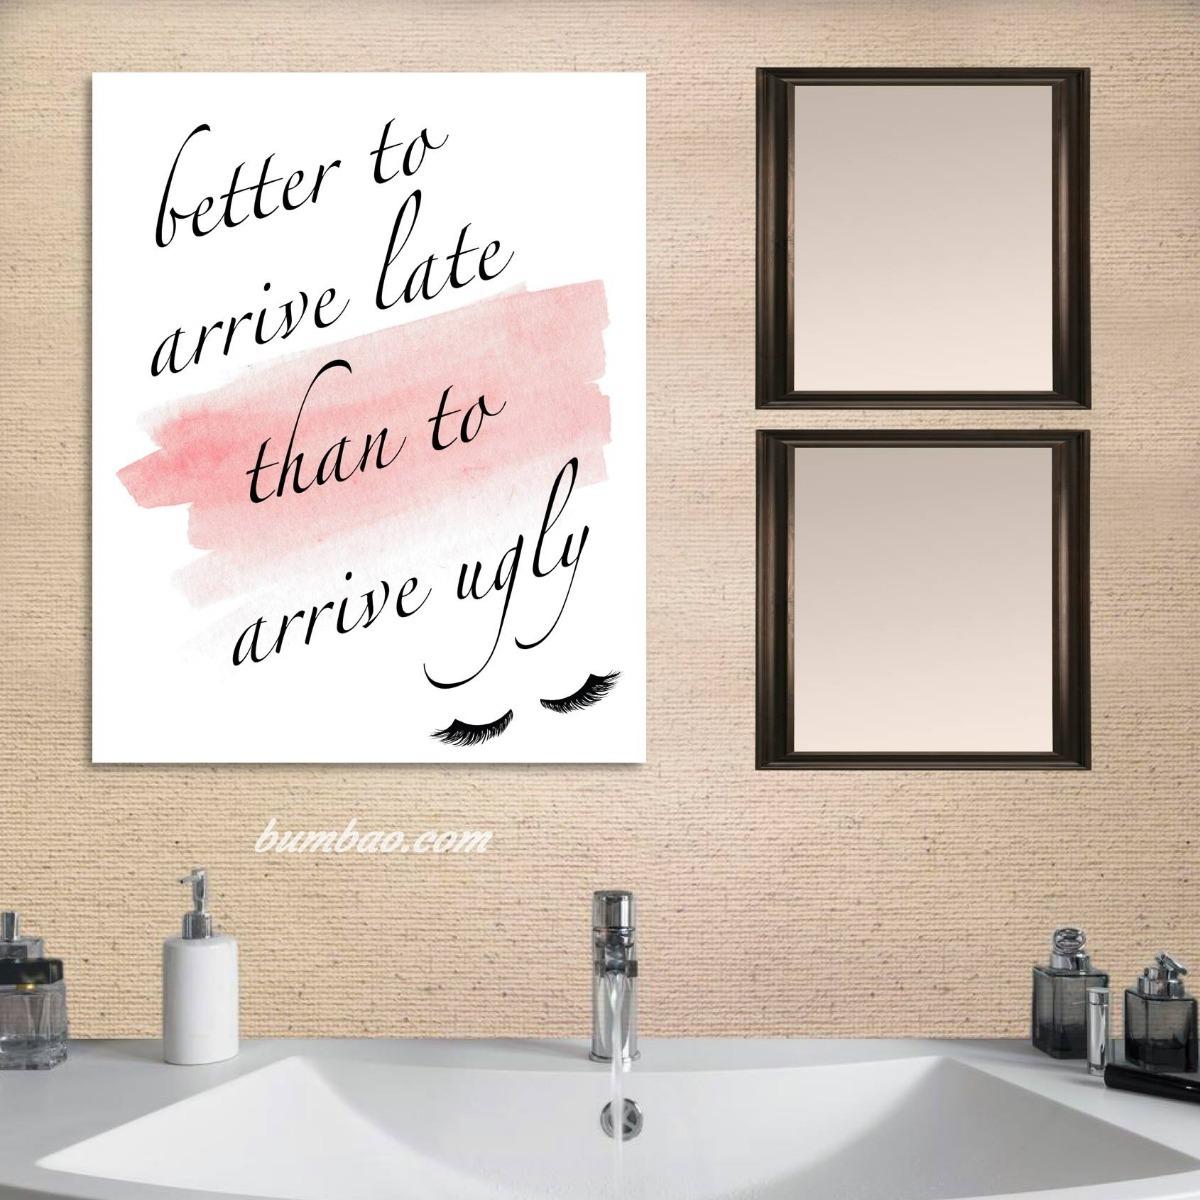 Cuadros decorativos para ba o frases motivacionales - Cuadros para bano ...